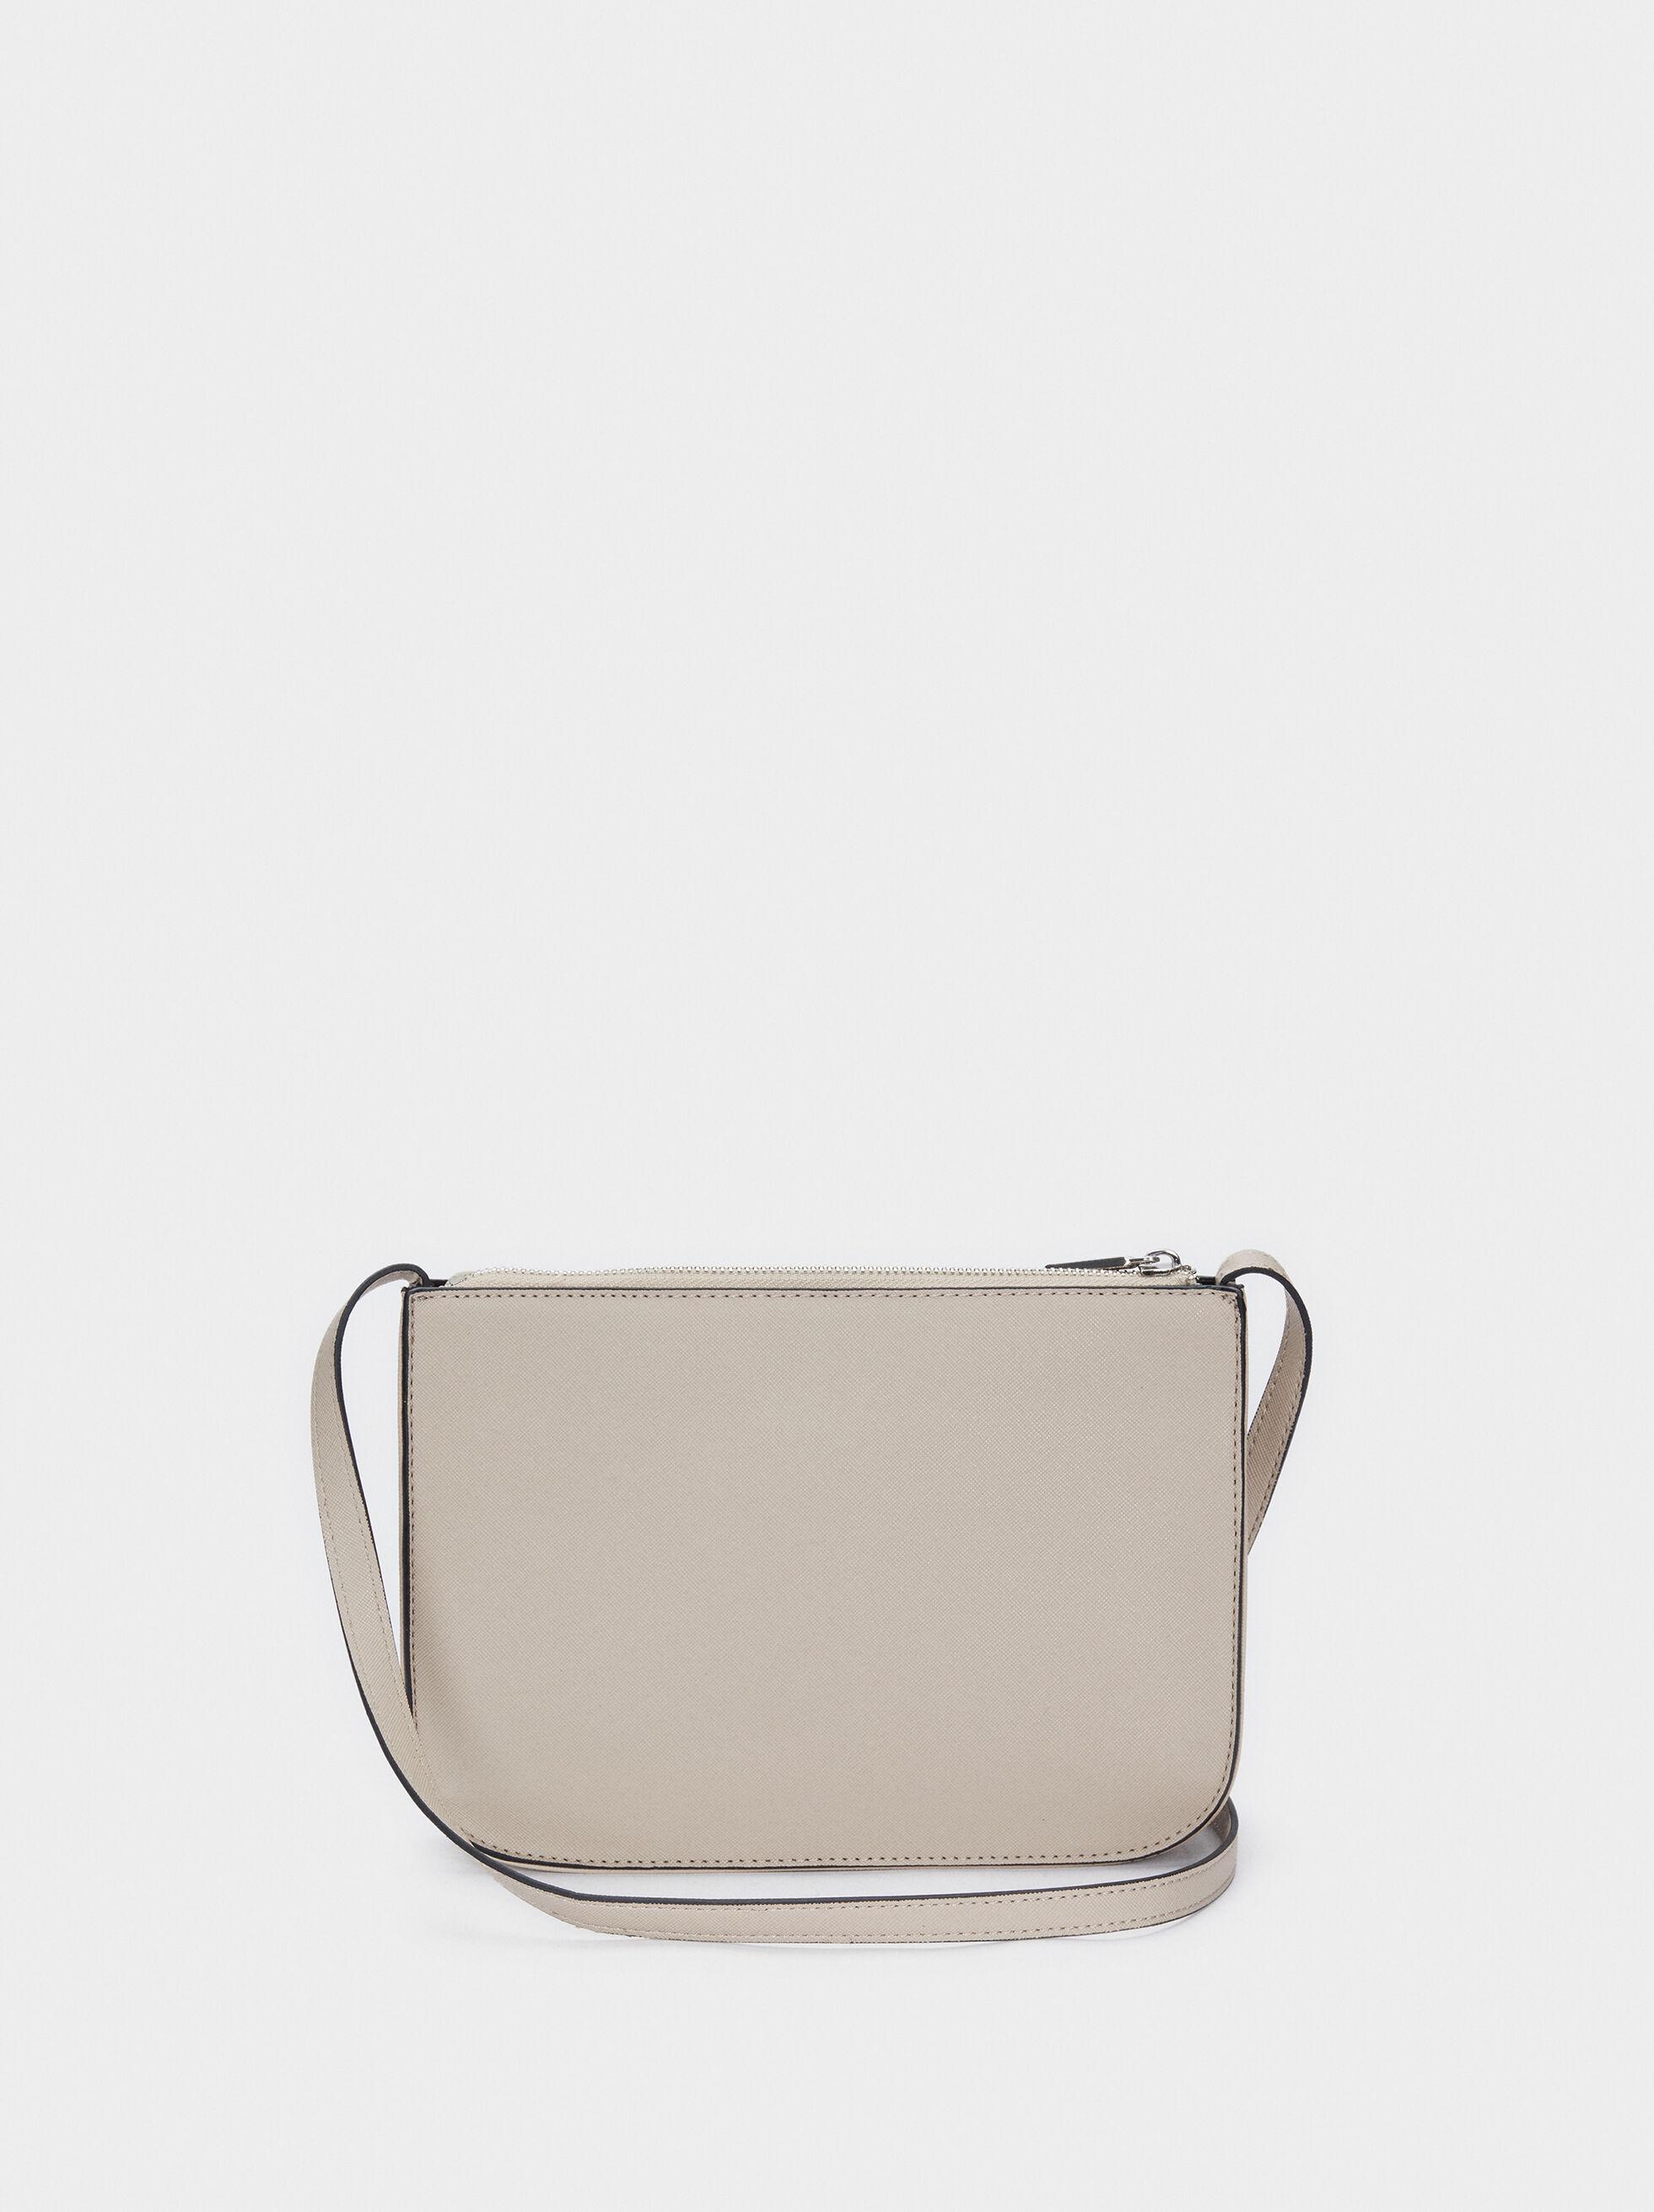 Crossbody Bag With Outer Pocket, Grey, hi-res